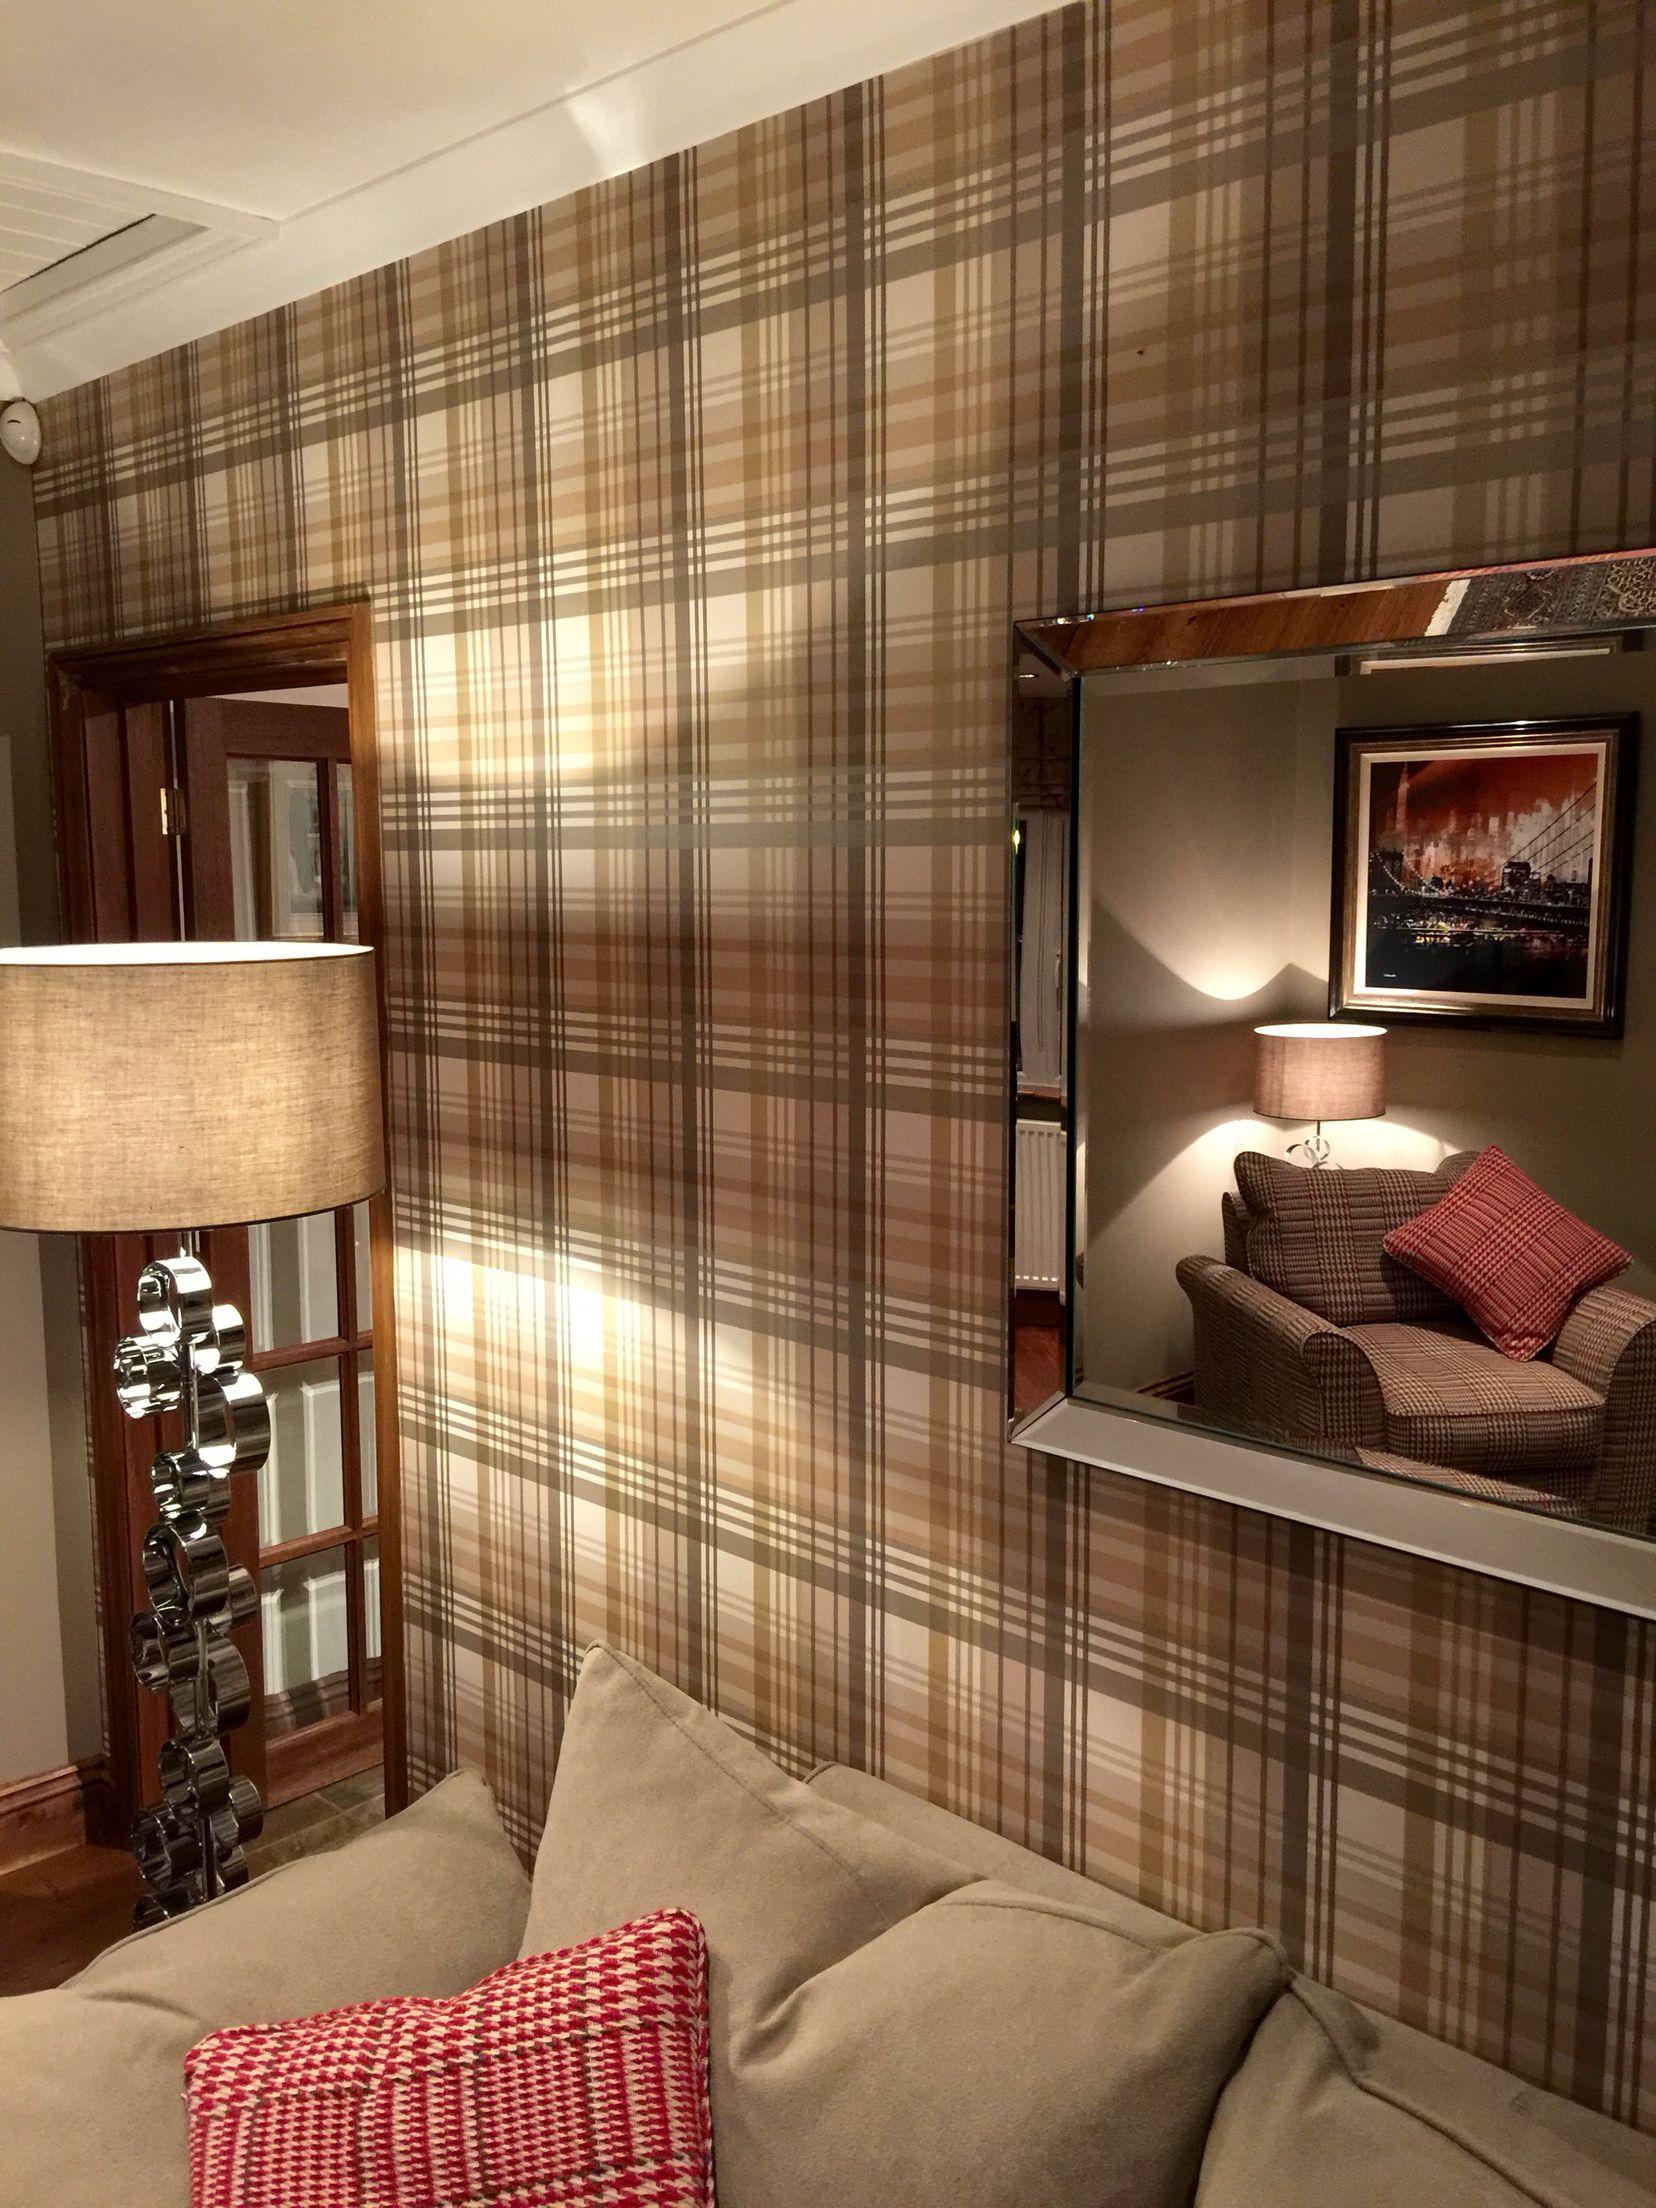 One Bedroom Apartment Interior Decoration